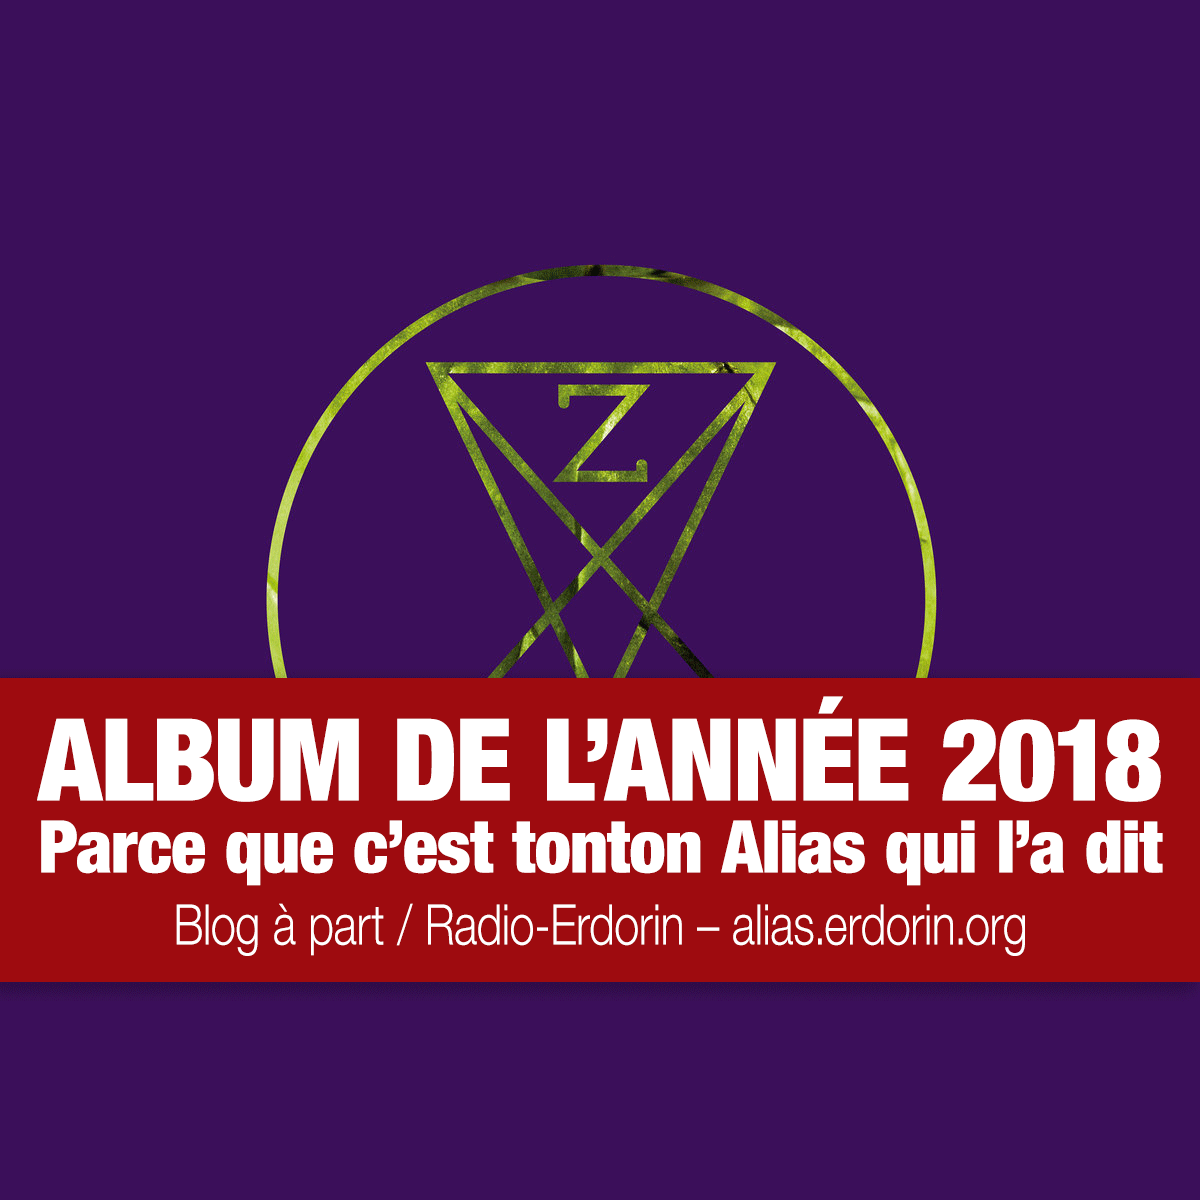 Zeal & Ardor: Stranger Fruit (album de l'année 2018)